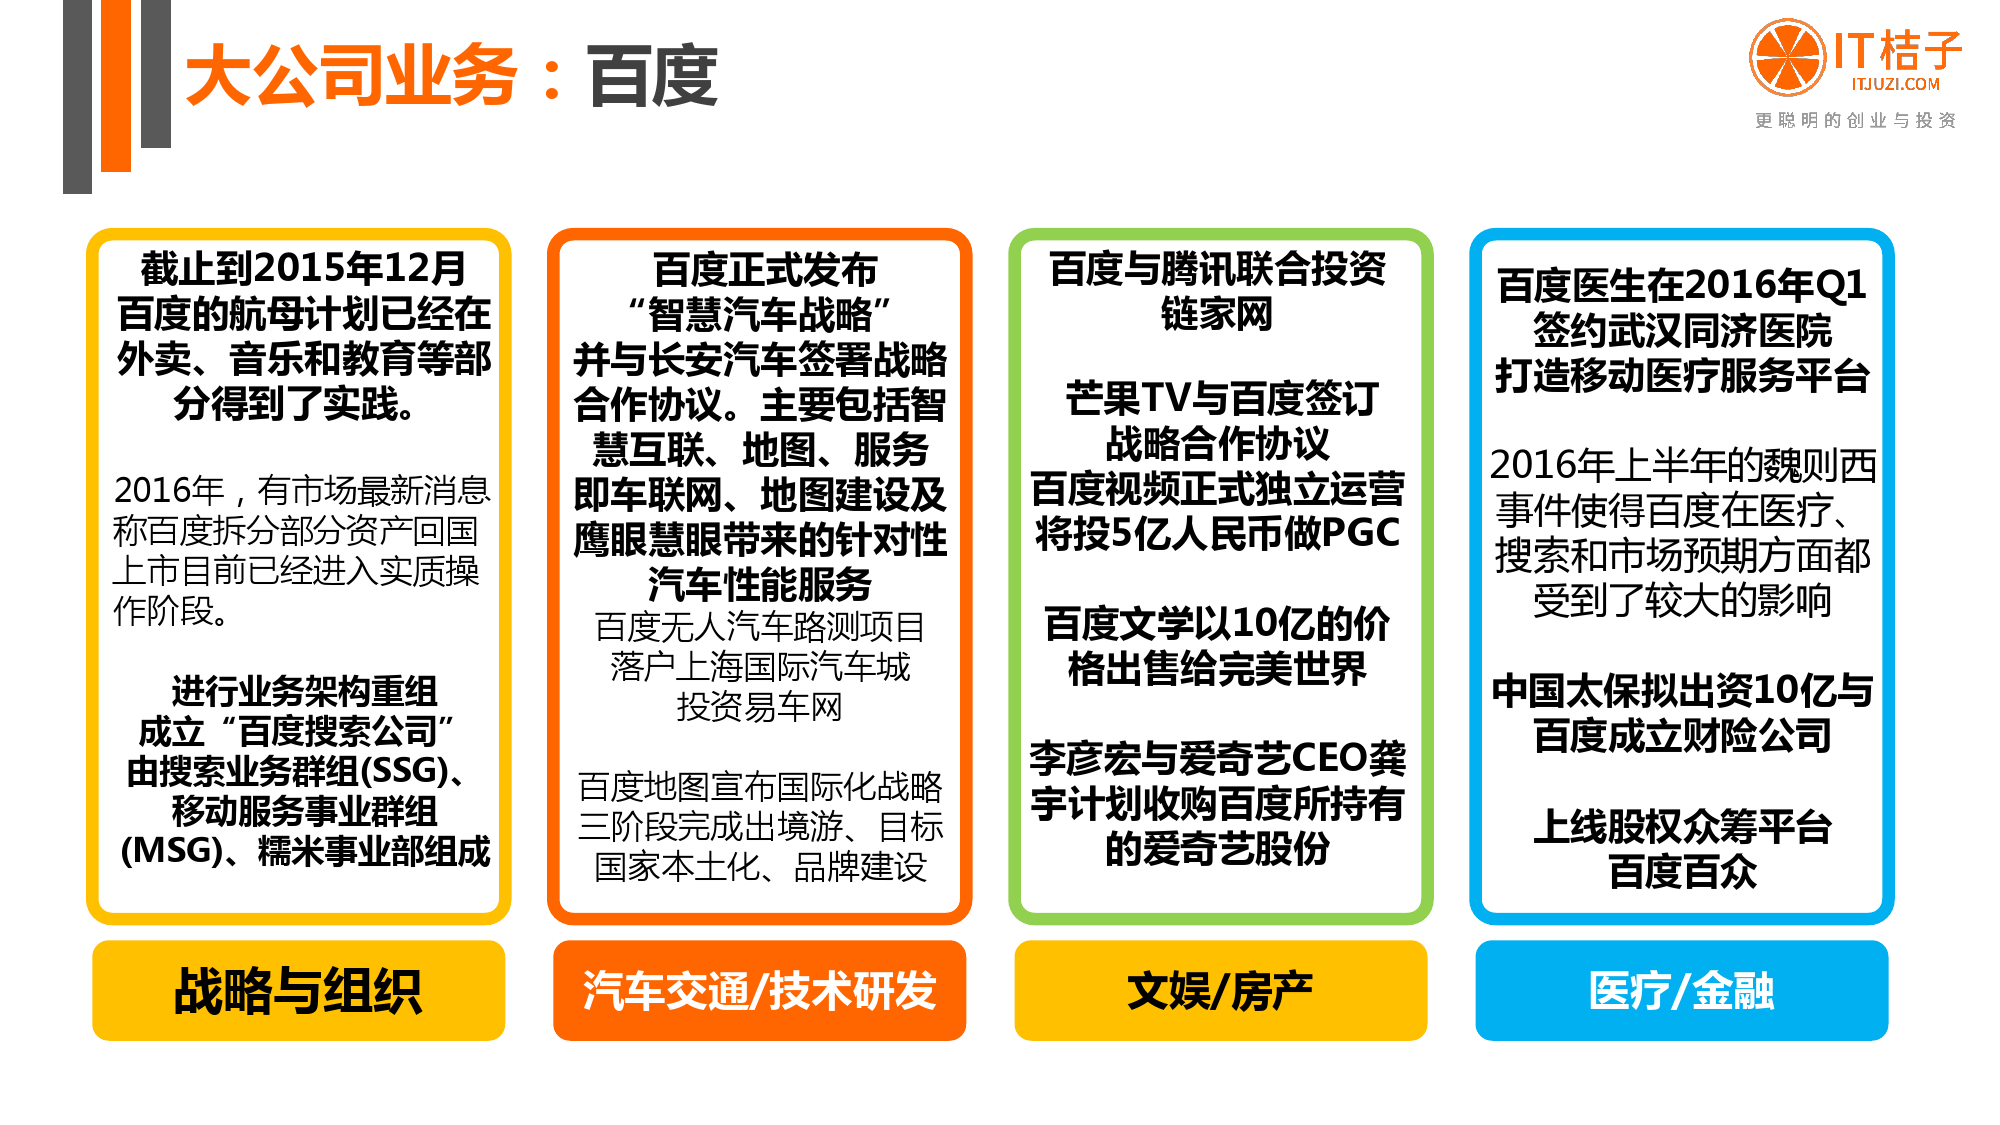 【IT桔子】2016年Q2中国互联网创业投资分析报告_000063